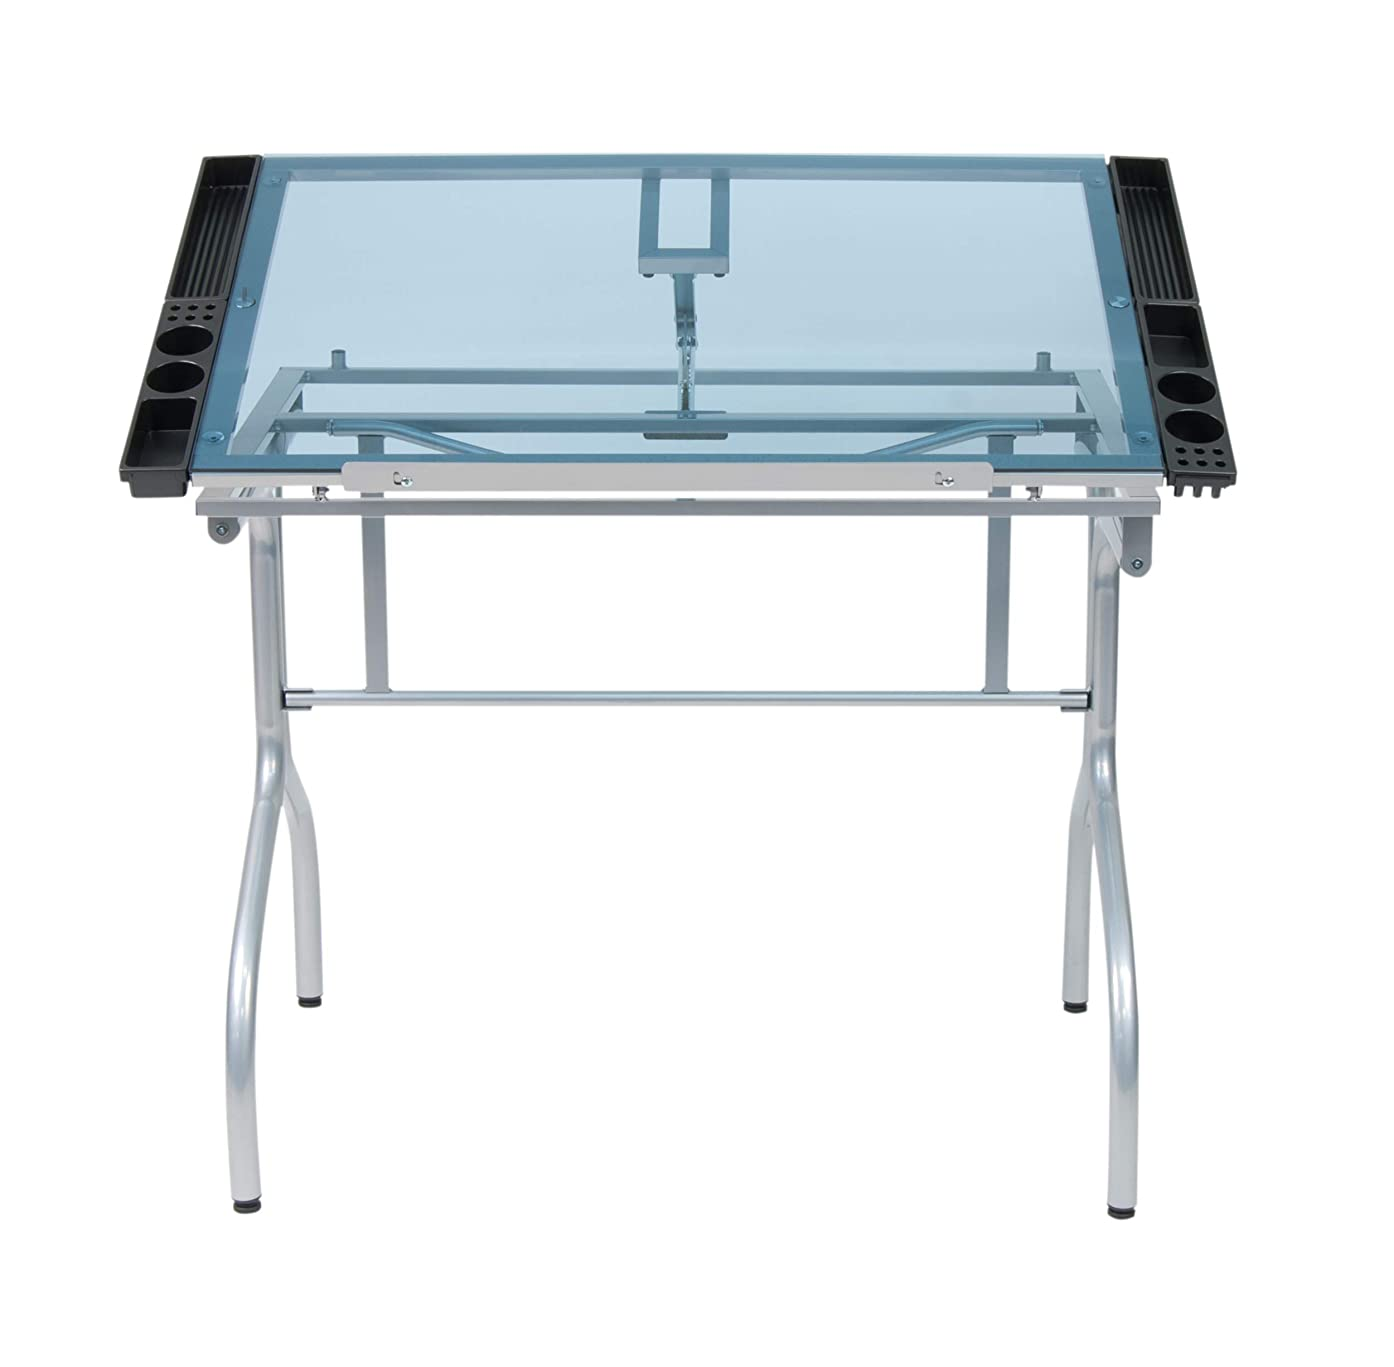 Studio Designs Folding Modern Glass Top Adjustable Drafting Table Craft Table Drawing Desk Hobby Table Writing Desk Studio Desk, 35.25